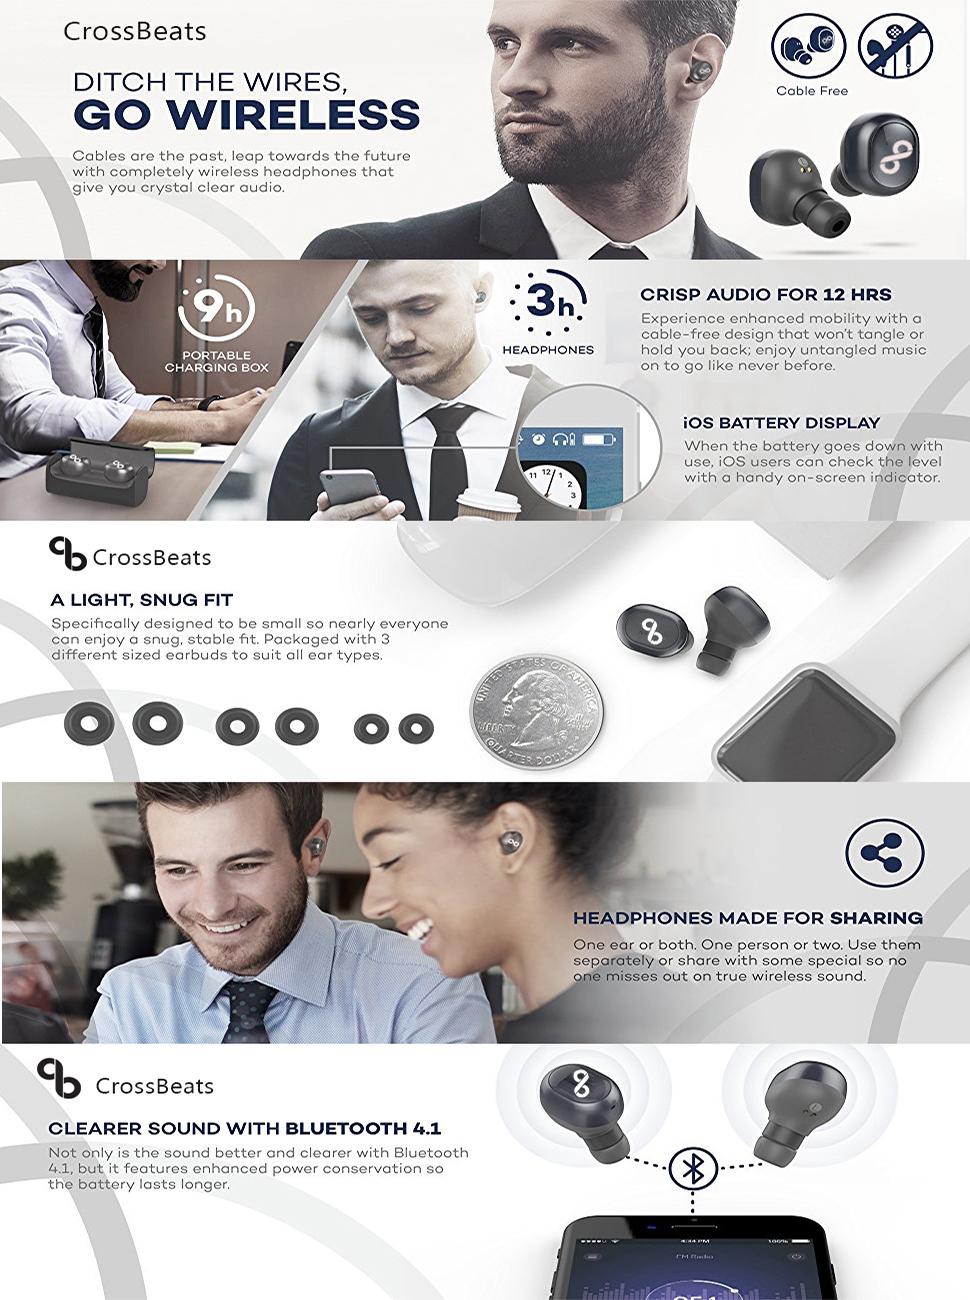 Crossbeats Soul True Wireless Bluetooth Earphones With Hands Free Headset 41 Handsfree Headphones Earbud Mini L1 Sj0048 Most Advanced Mic Tws